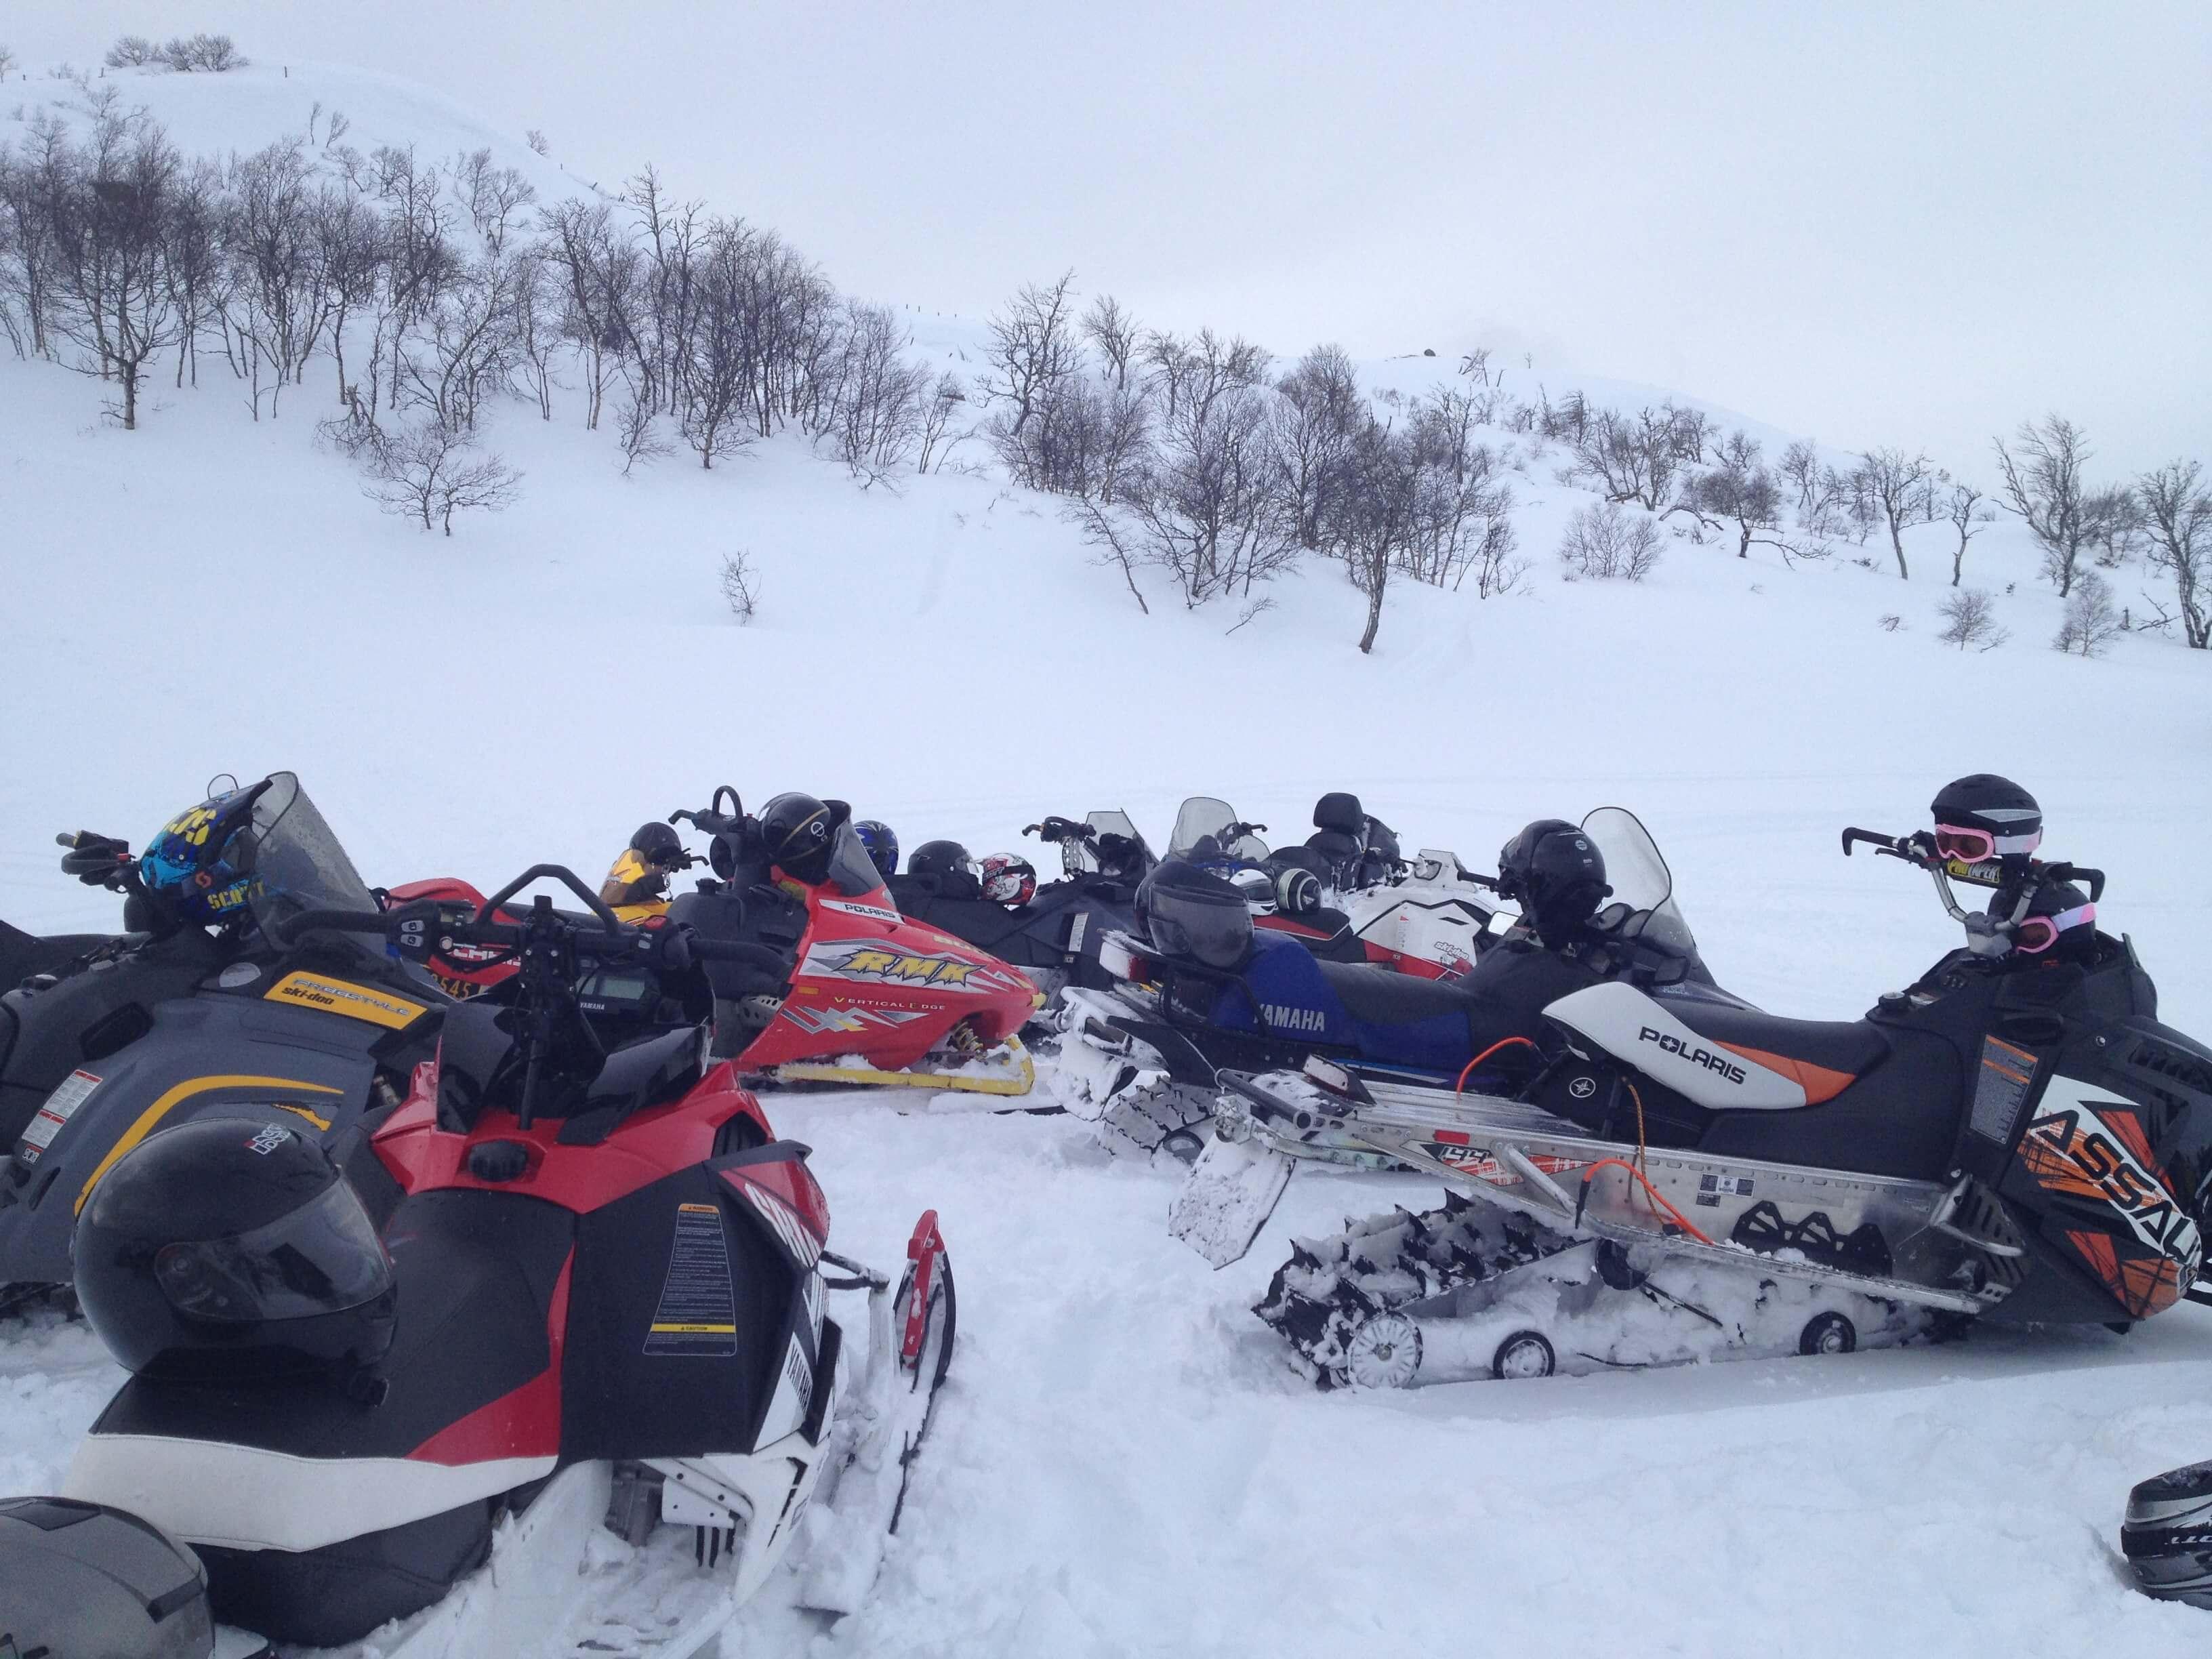 Snøscooter tur til Hekkfjellet 05. mars 2016